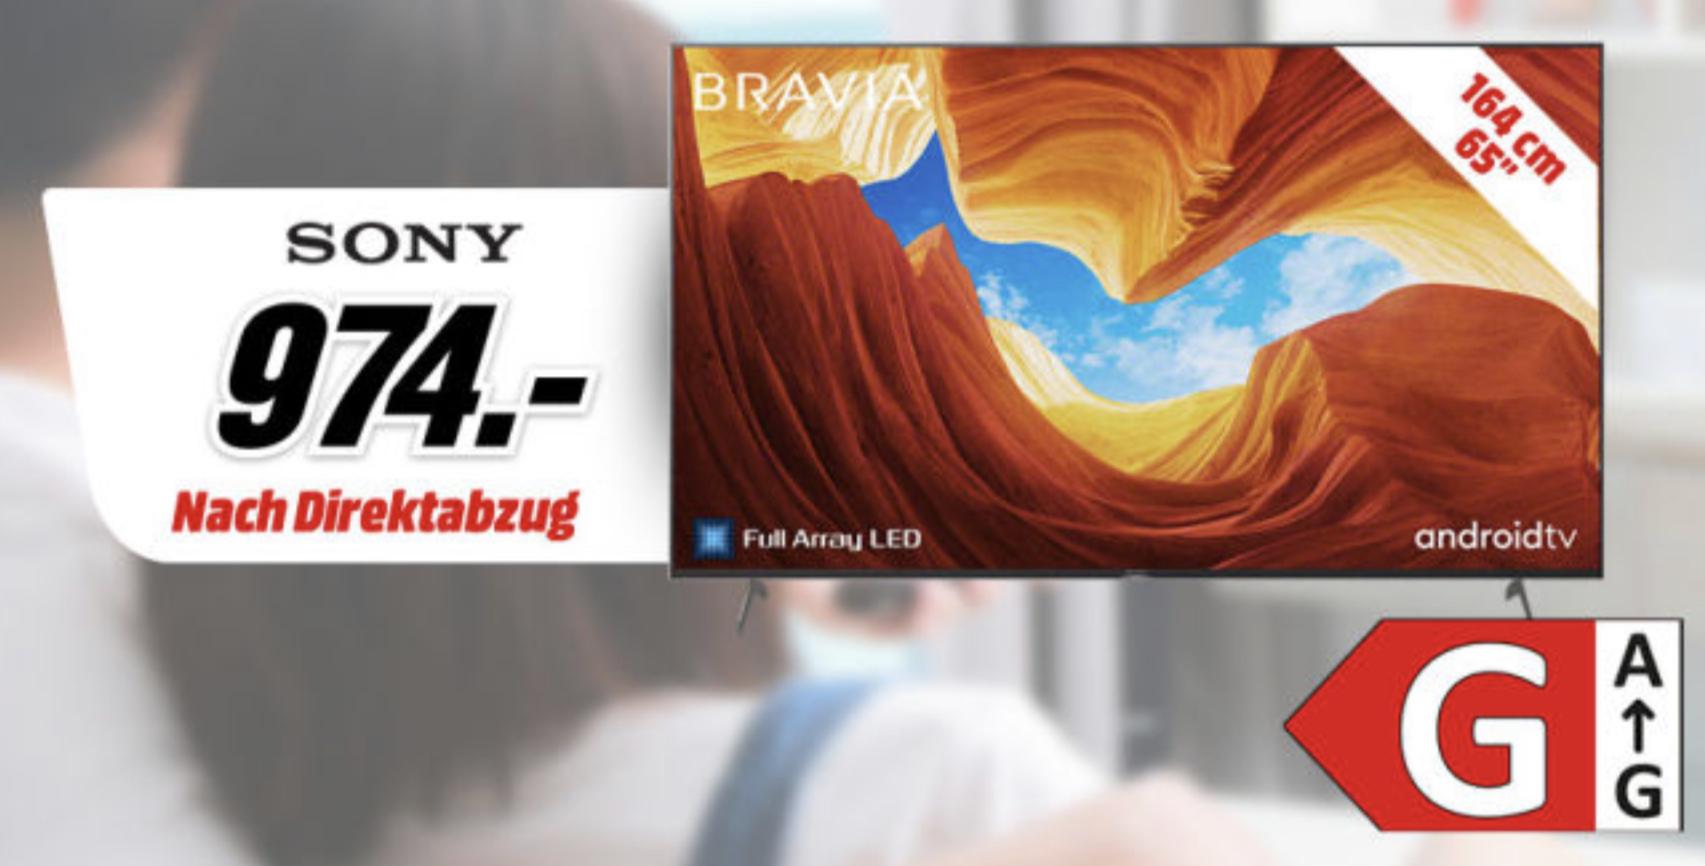 SONY KE-65XH9005 / KE-65XH9077 65 Zoll 164cm FALD 4K UHD SMART TV schwarz o. silber für je 964€ inkl. Versandkosten